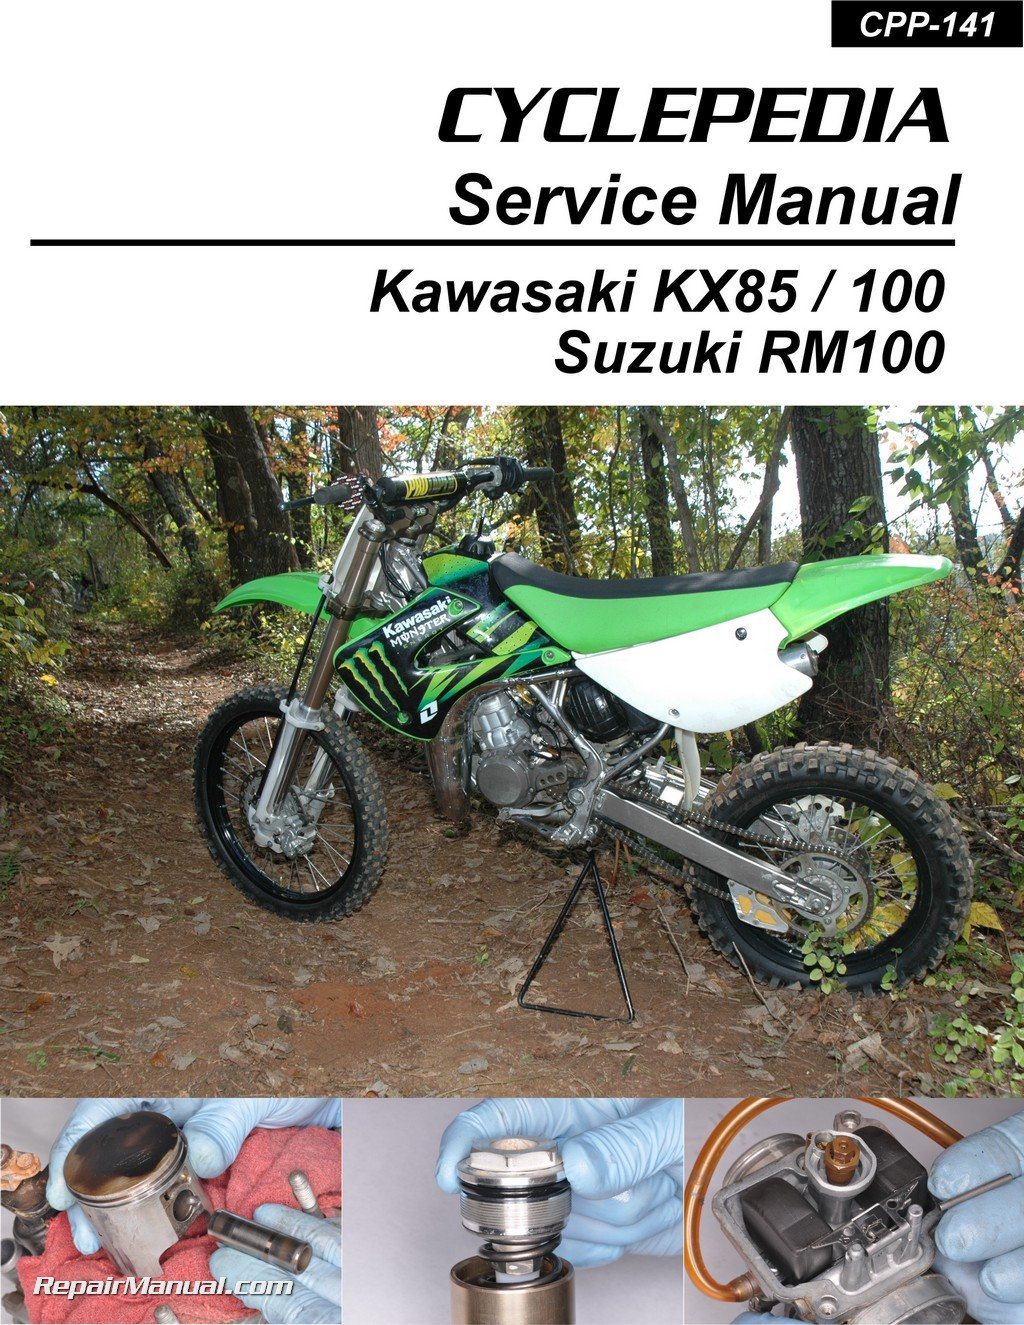 CPP-141-P Kawasaki KX85 KX100 Suzuki RM100 Cyclepedia Printed Motorcycle Service  Manual: Manufacturer: Amazon.com: Books